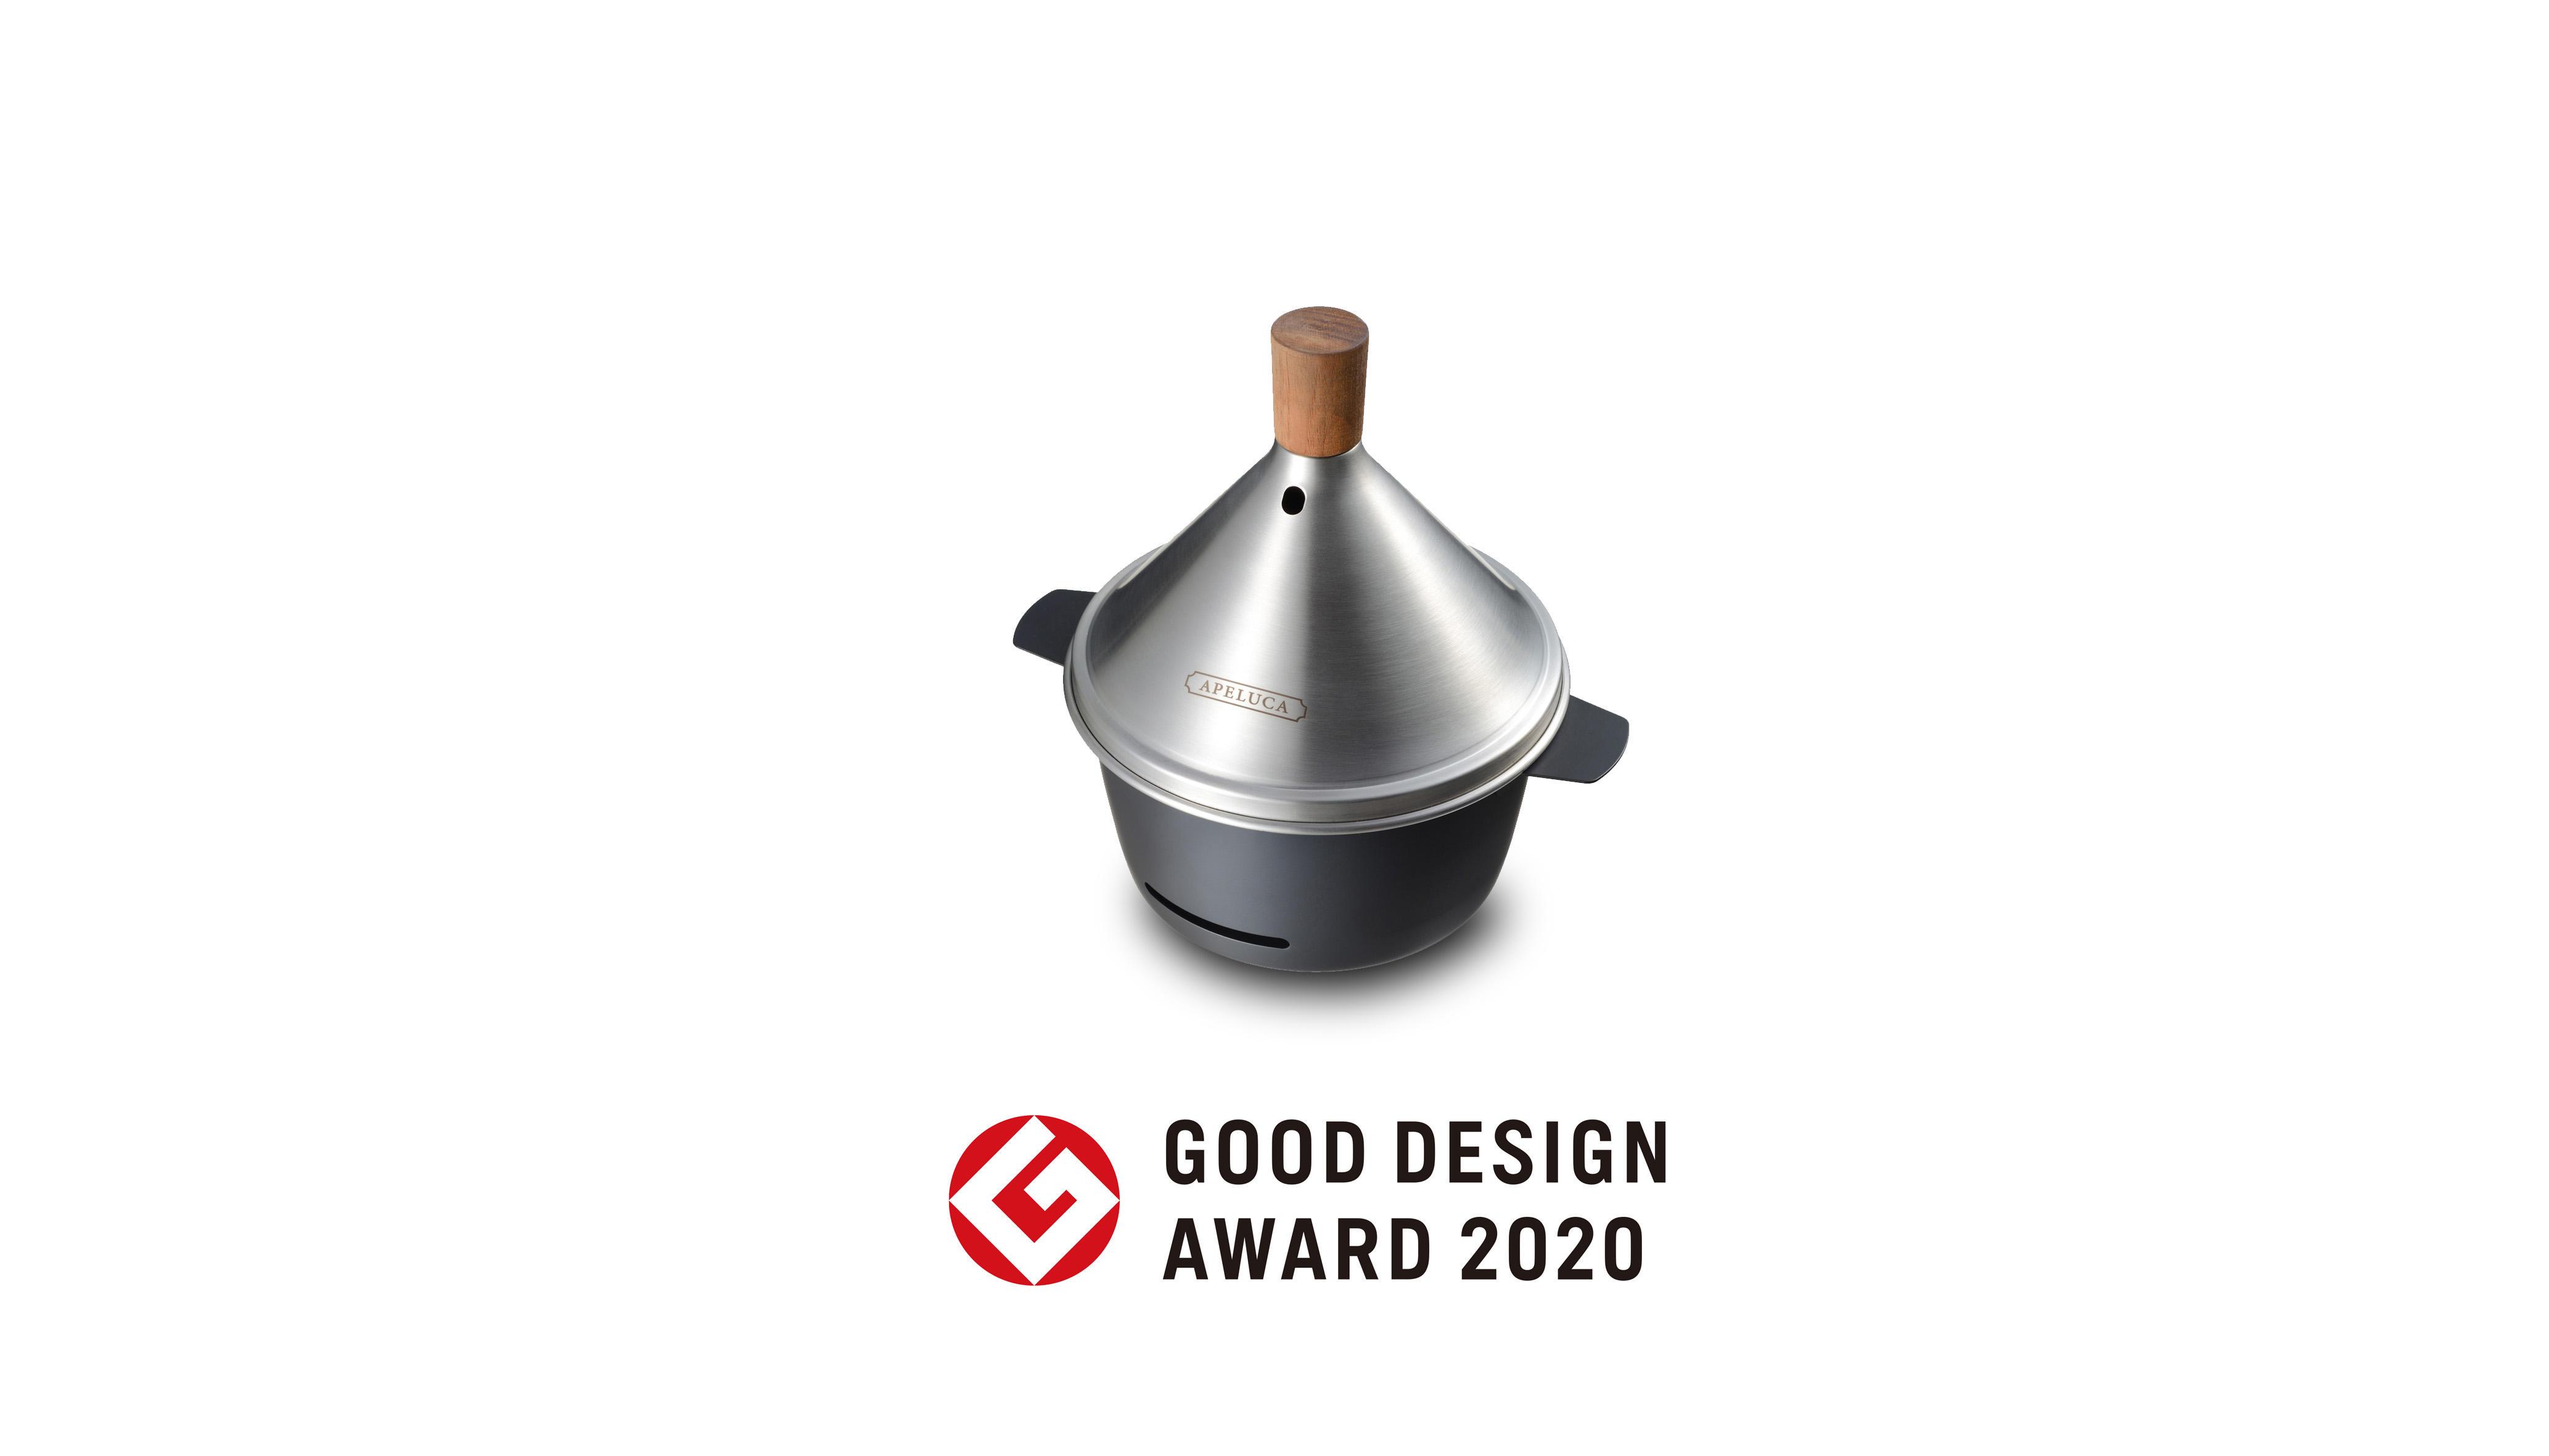 「TABLETOP SMOKER」が2020年度グッドデザイン賞を受賞